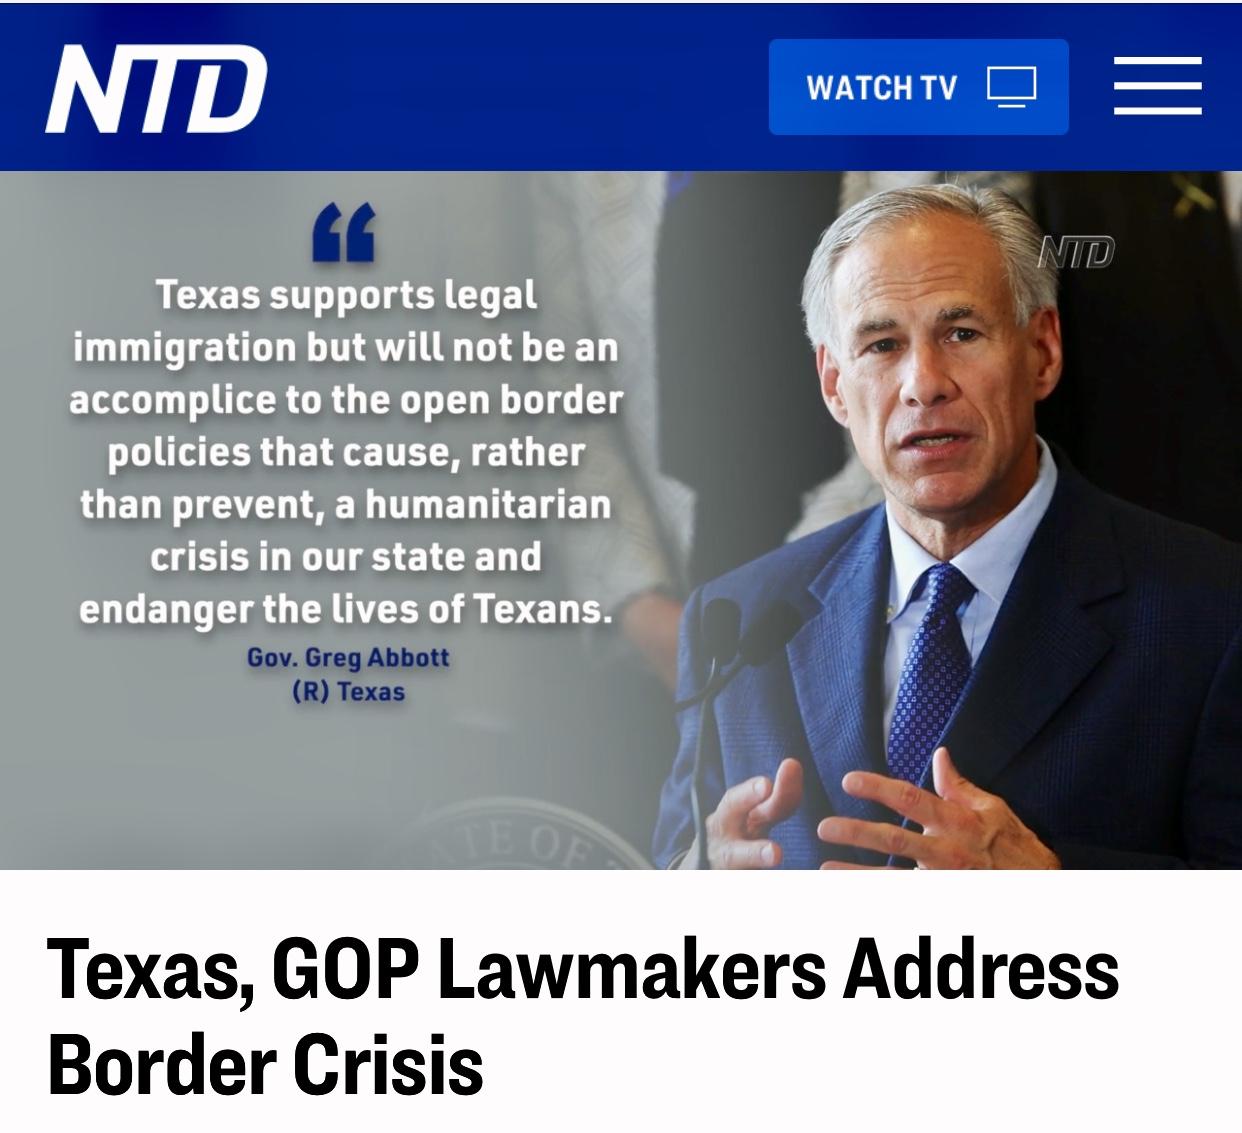 Texas, GOP Lawmakers Address Border Crisis Video